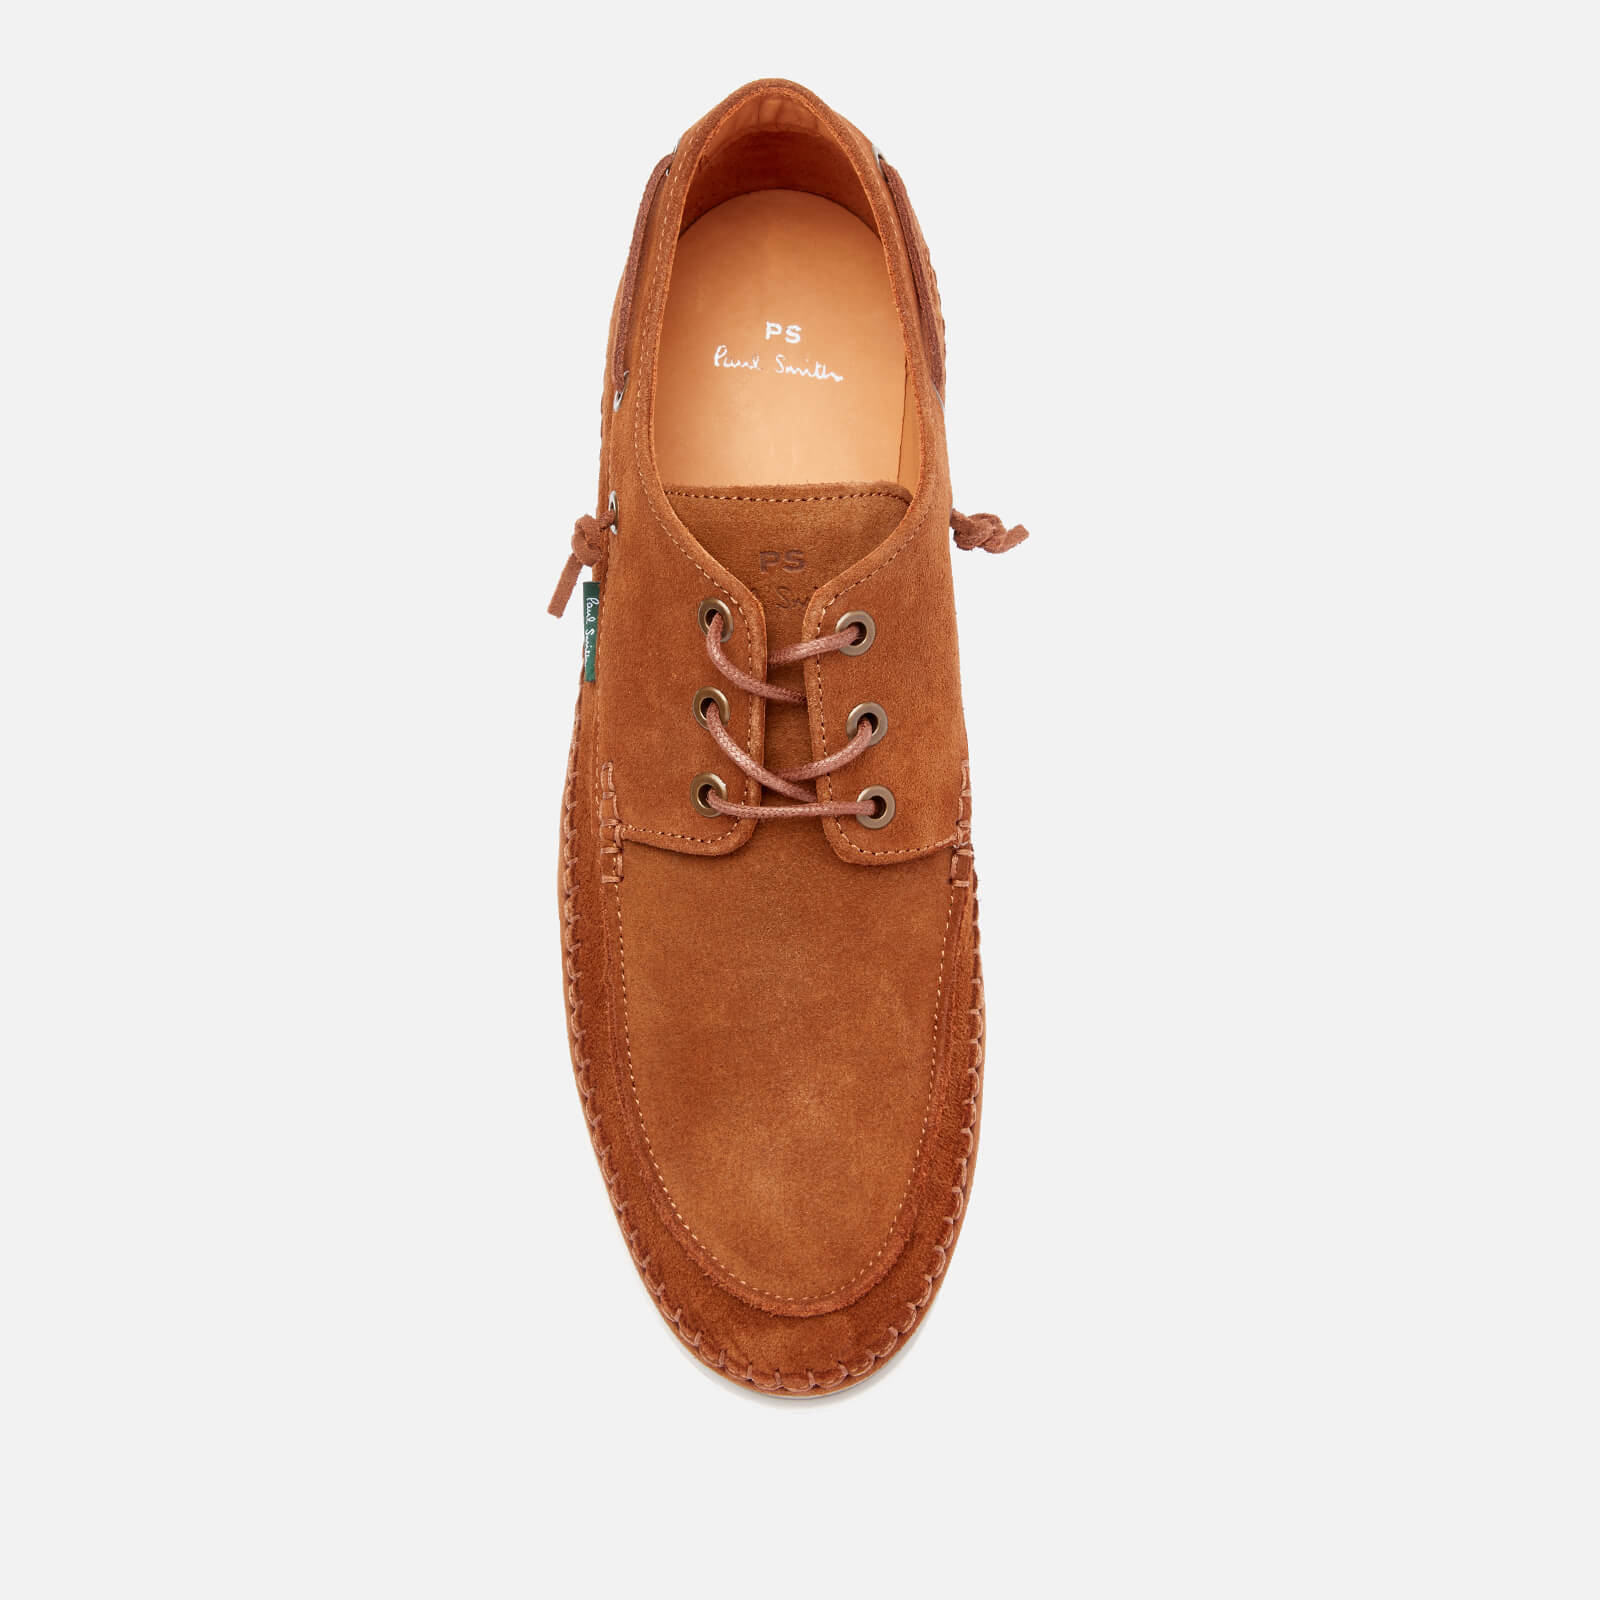 ps paul smith men's hobbs suede boat shoes - tan - uk 7